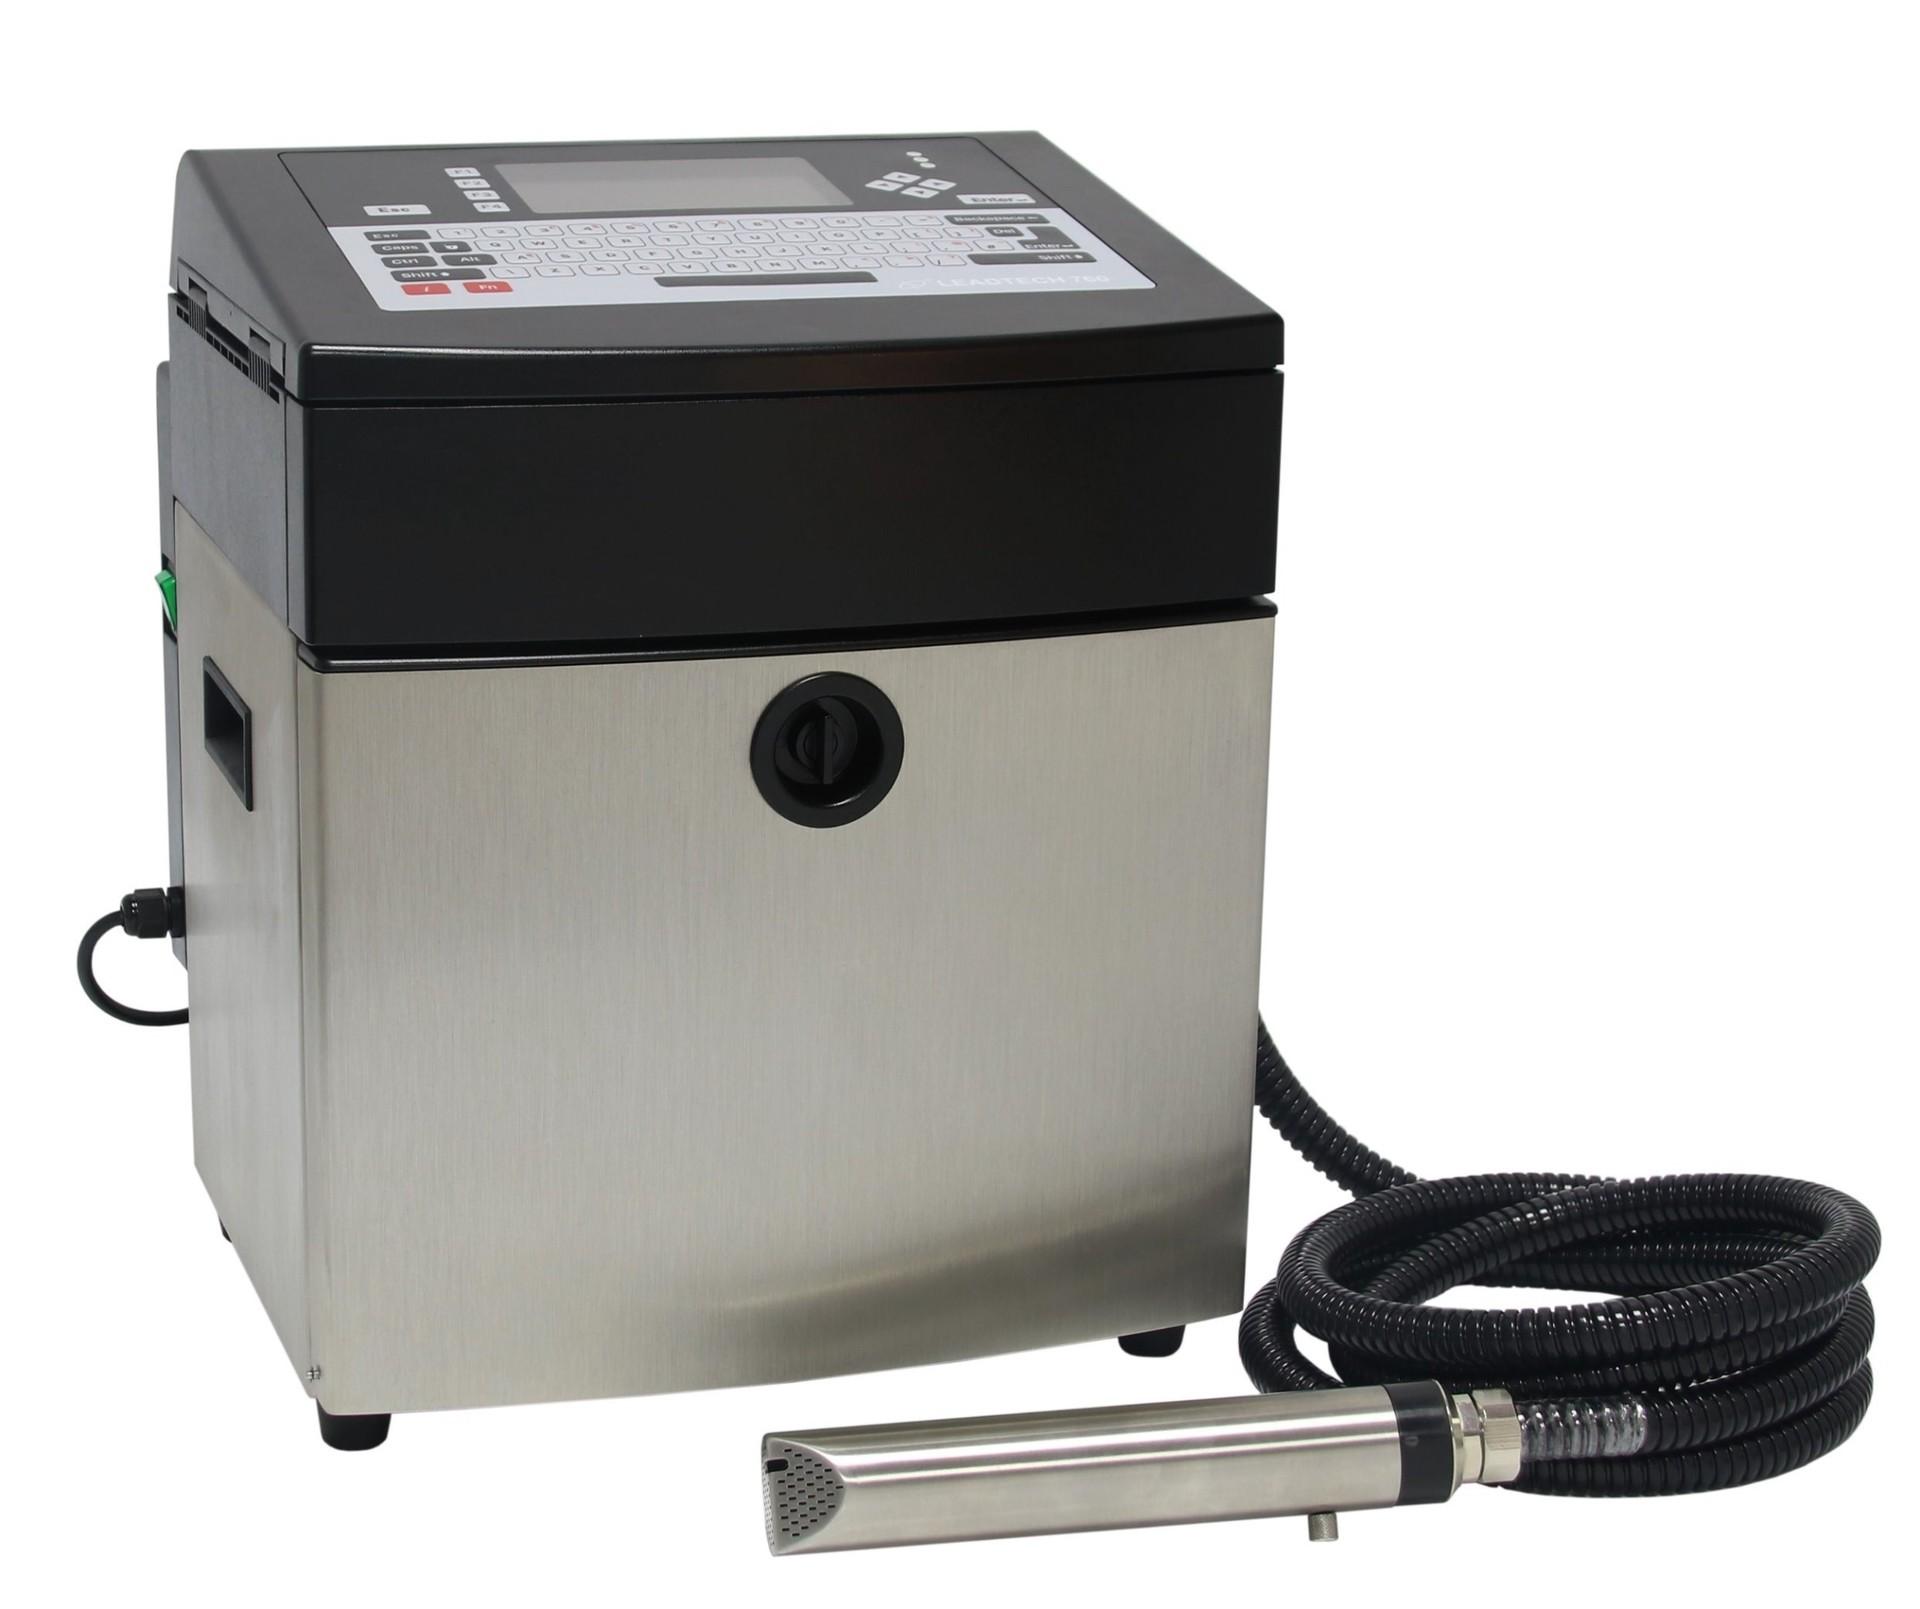 Lead Tech Dole Can Coding Continuous Cij Inkjet Printer Lt760